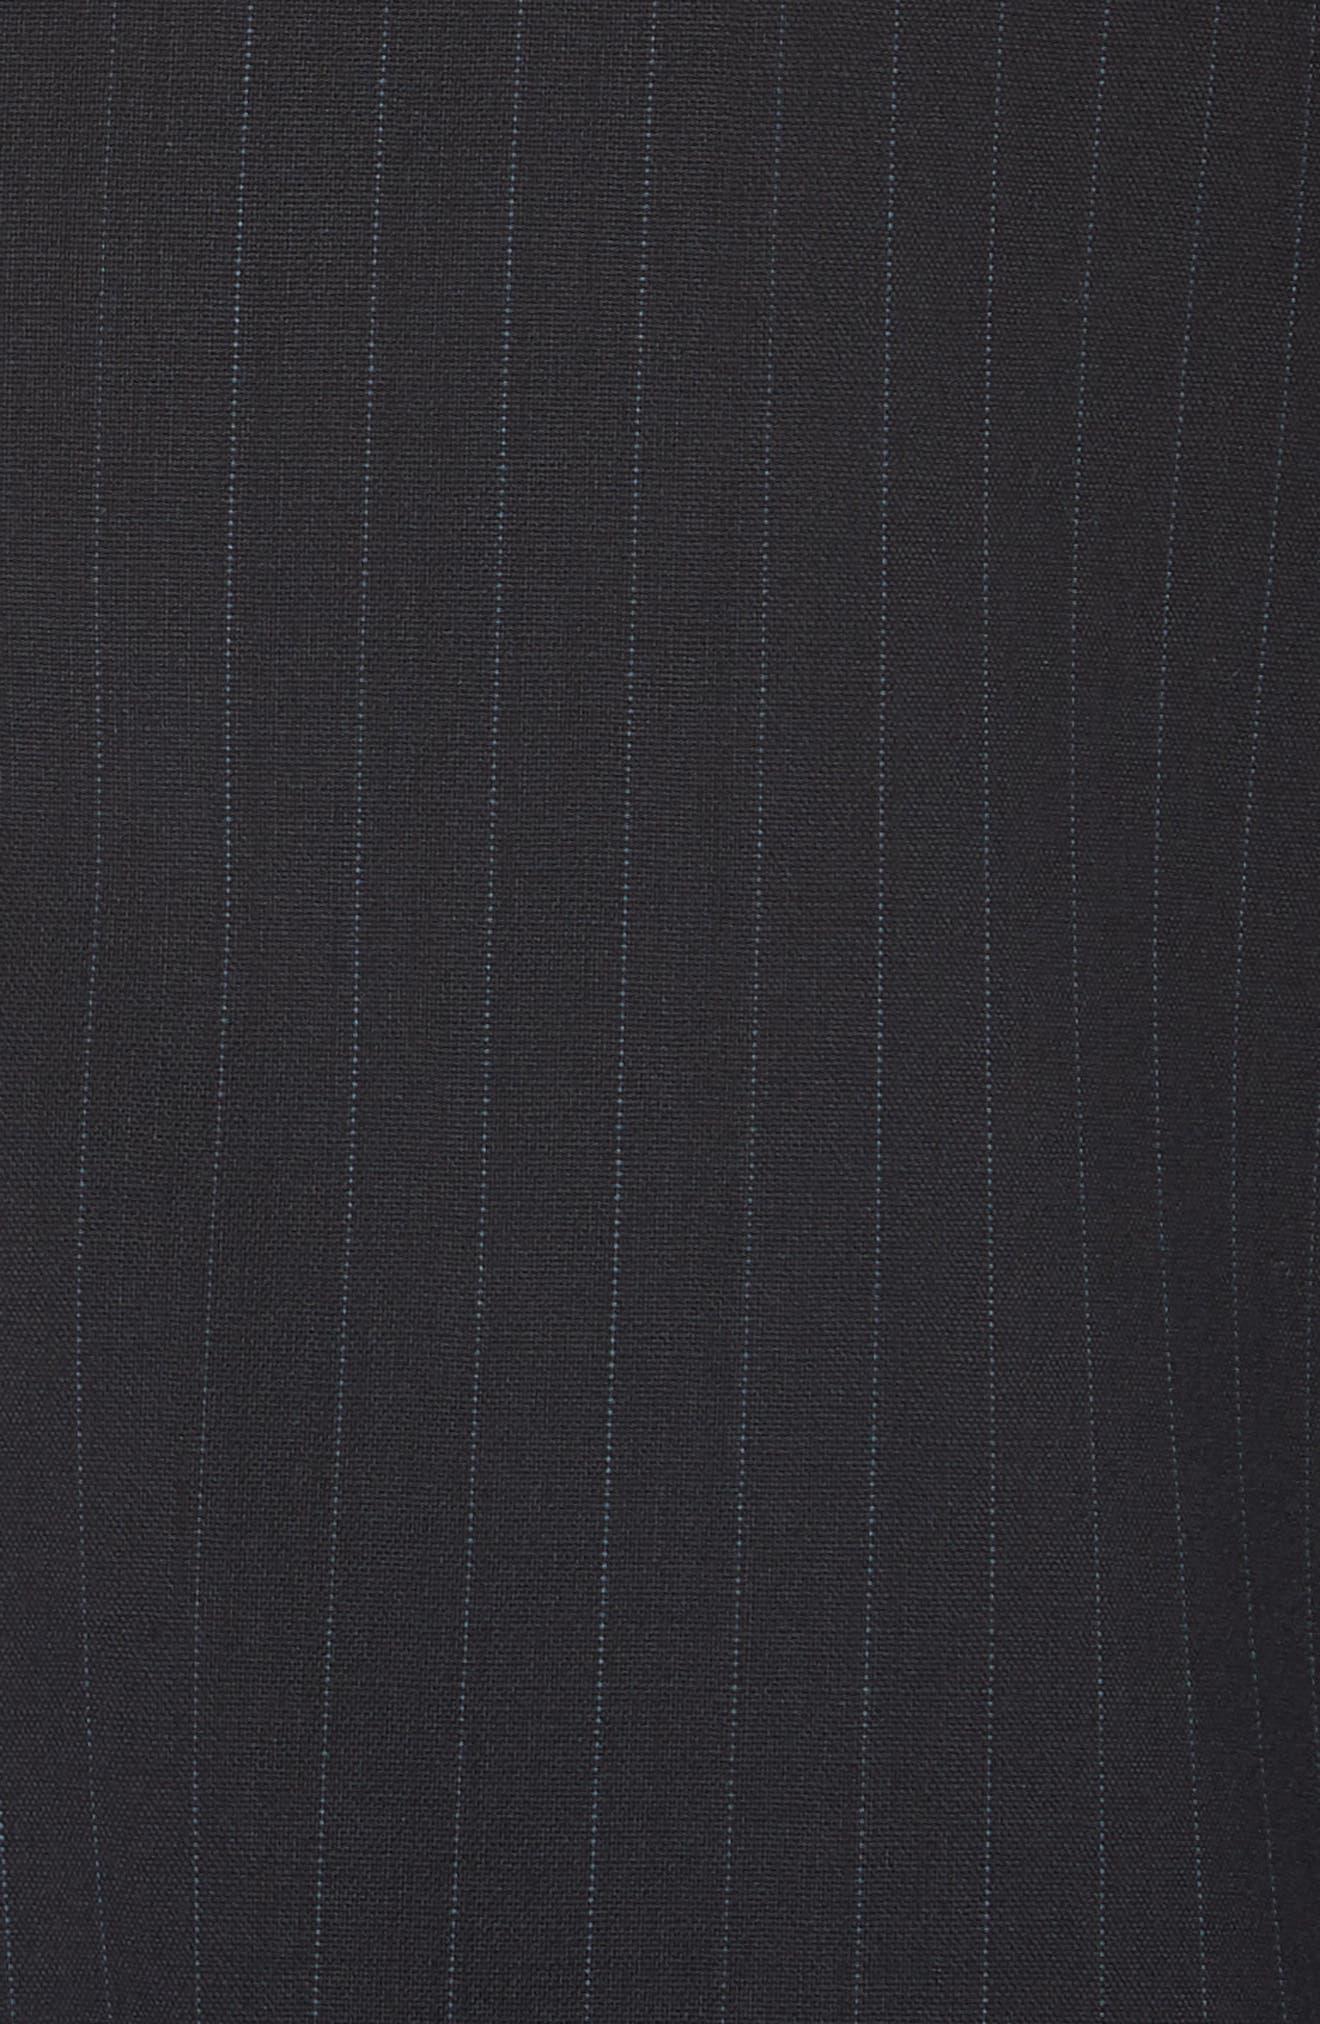 MAX MARA,                             Laser Single Button Wool Jacket,                             Alternate thumbnail 7, color,                             ULTRAMARINE